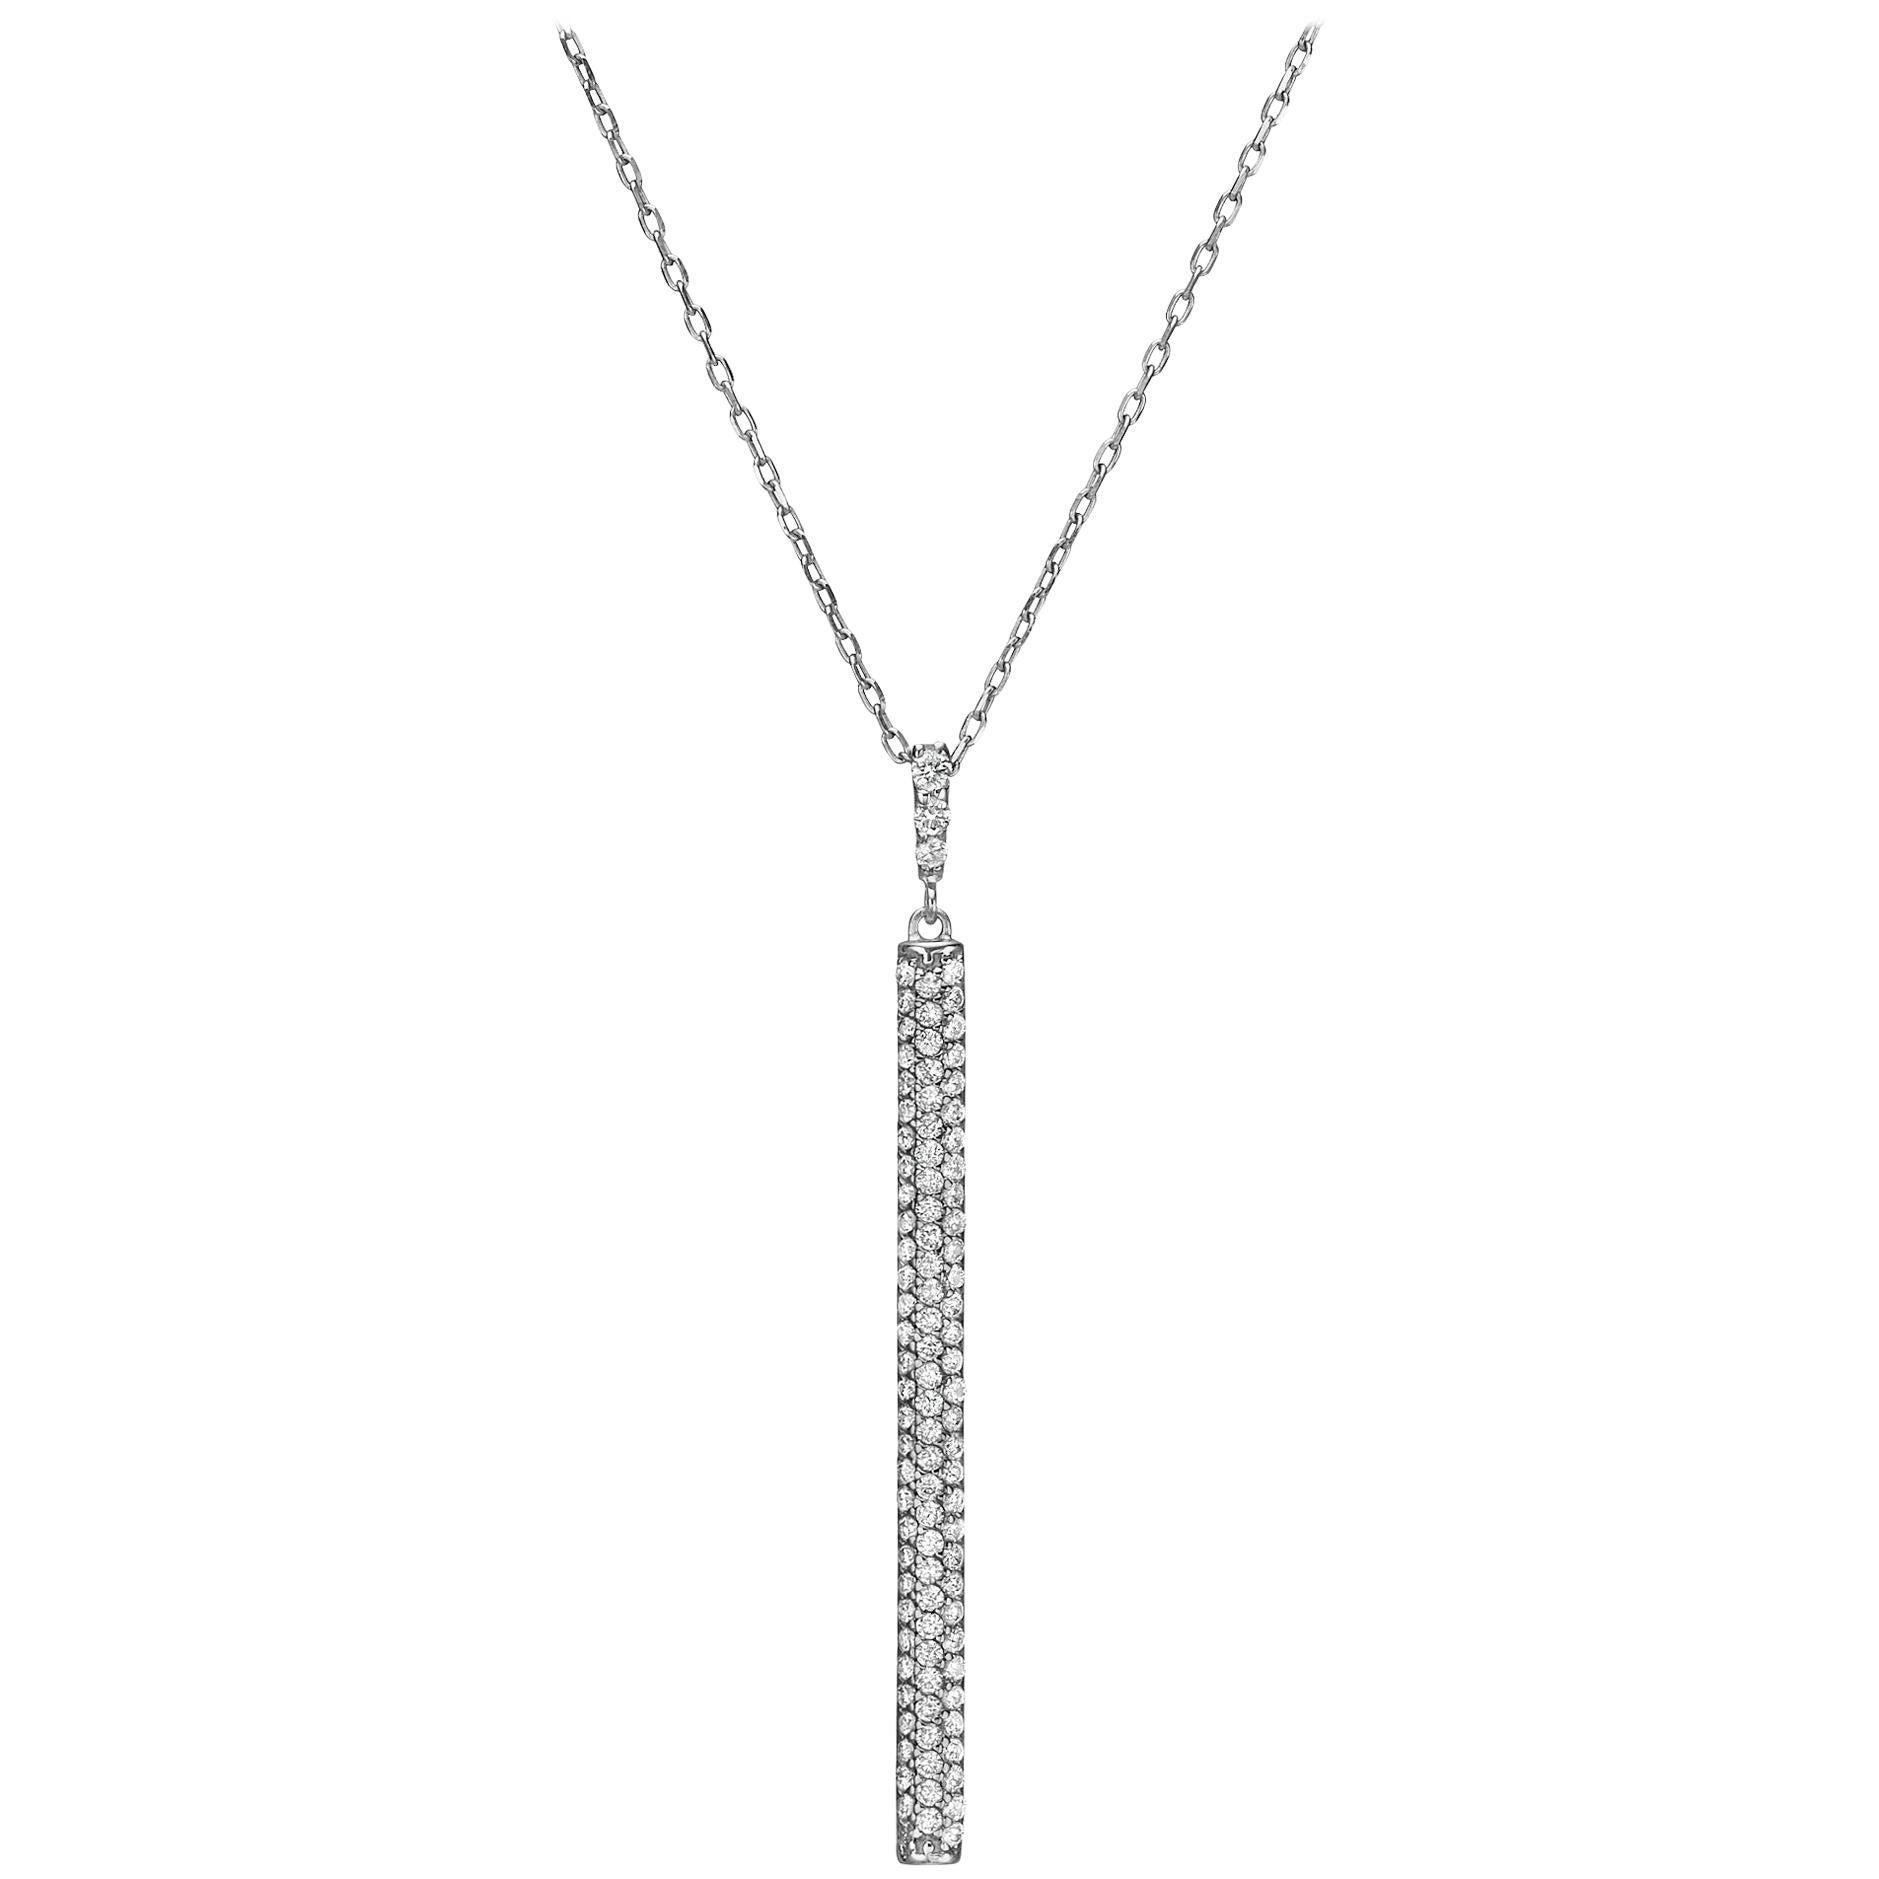 18k Gold, .70 Carat, F Color, VS Clarity, Diamond Vertical Bar Pendant Necklace